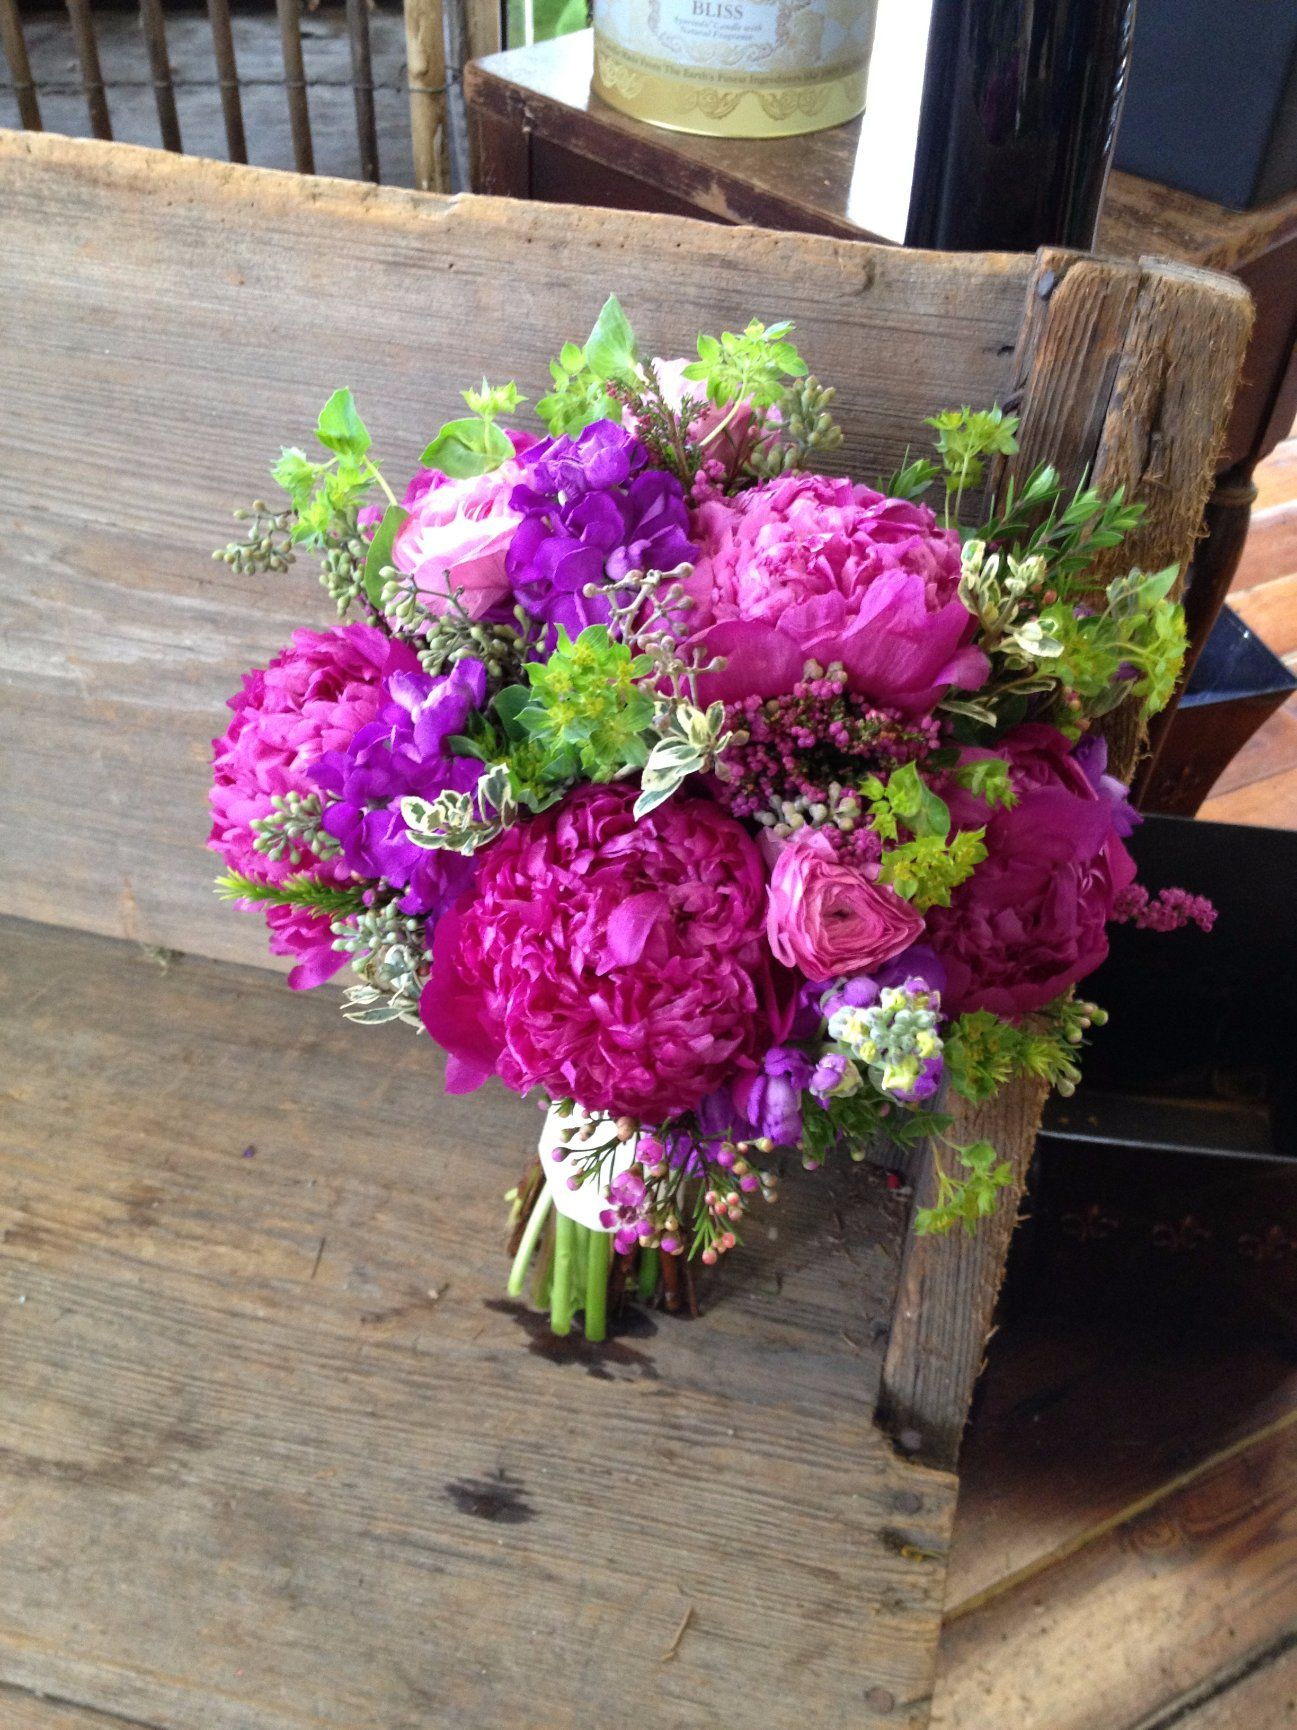 Pink Purple Peonies Colorful Bridal Bouquets By Nola Flora New Orleans Wedding Florist Www Nolaflora